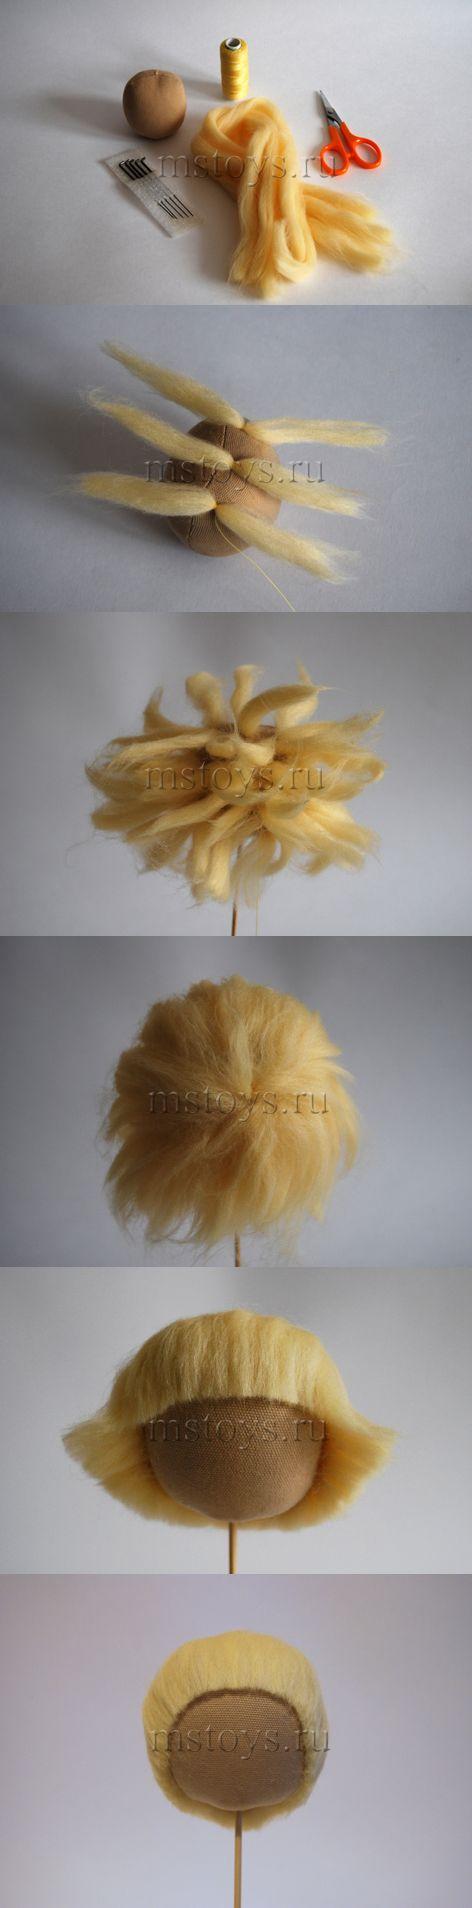 howto : hair